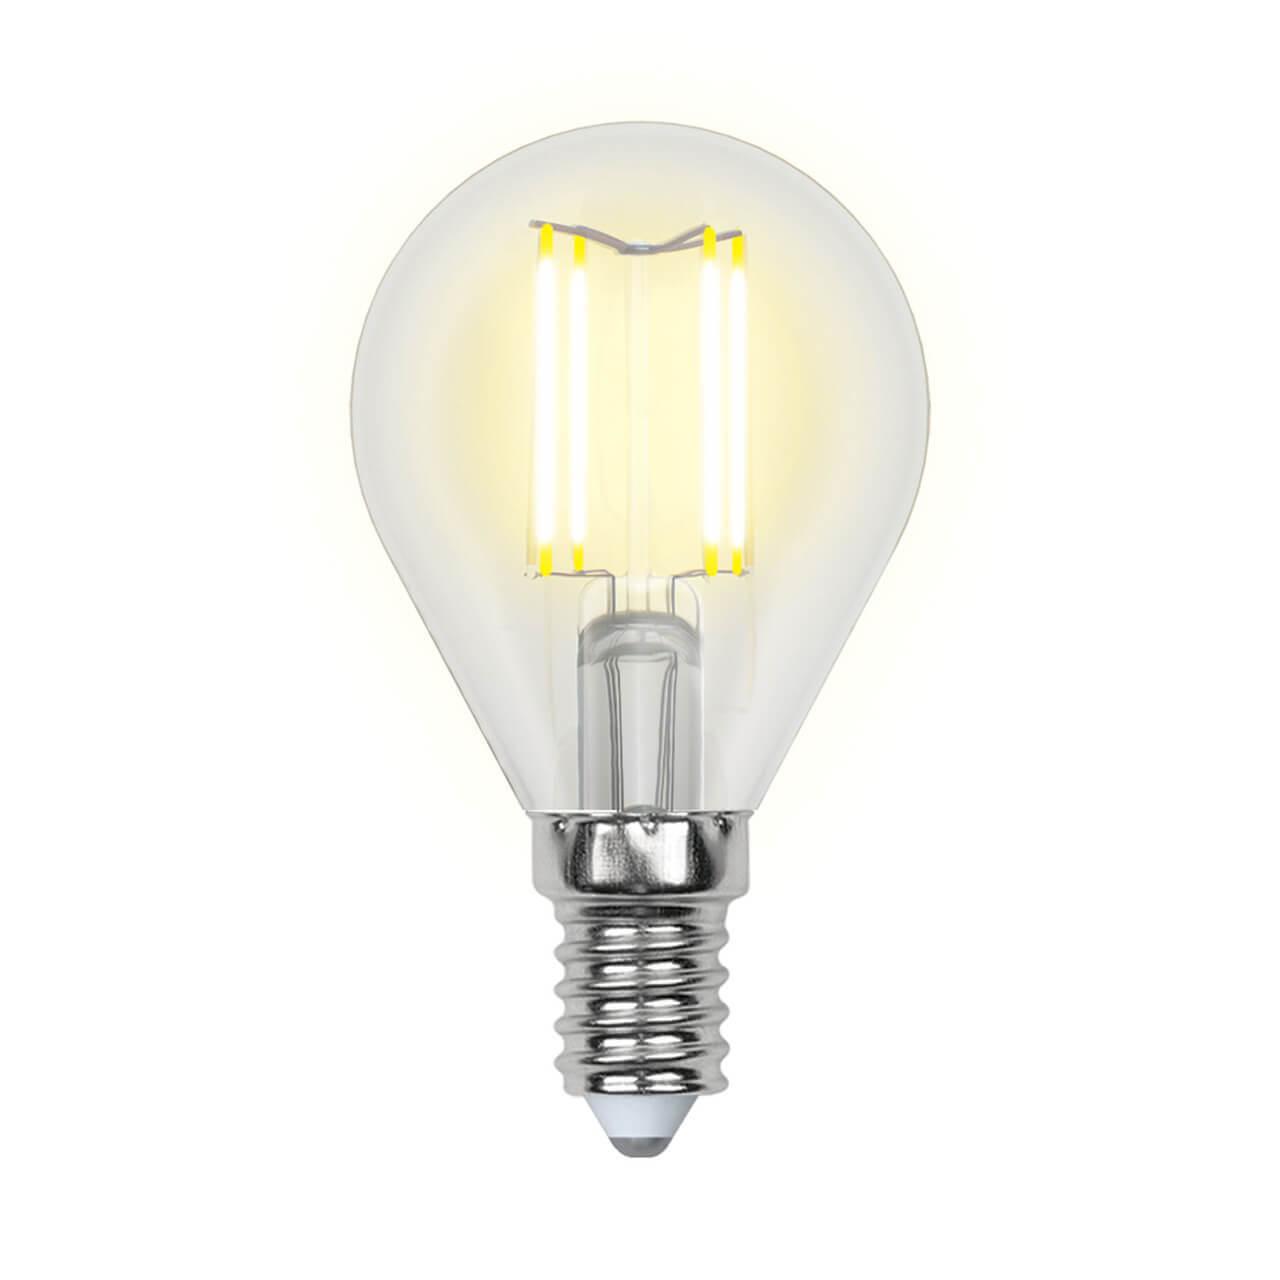 Лампа светодиодная филаментная E14 5W 3000K прозрачная LED-G45-5W/WW/E14/CL/MB GLM10TR